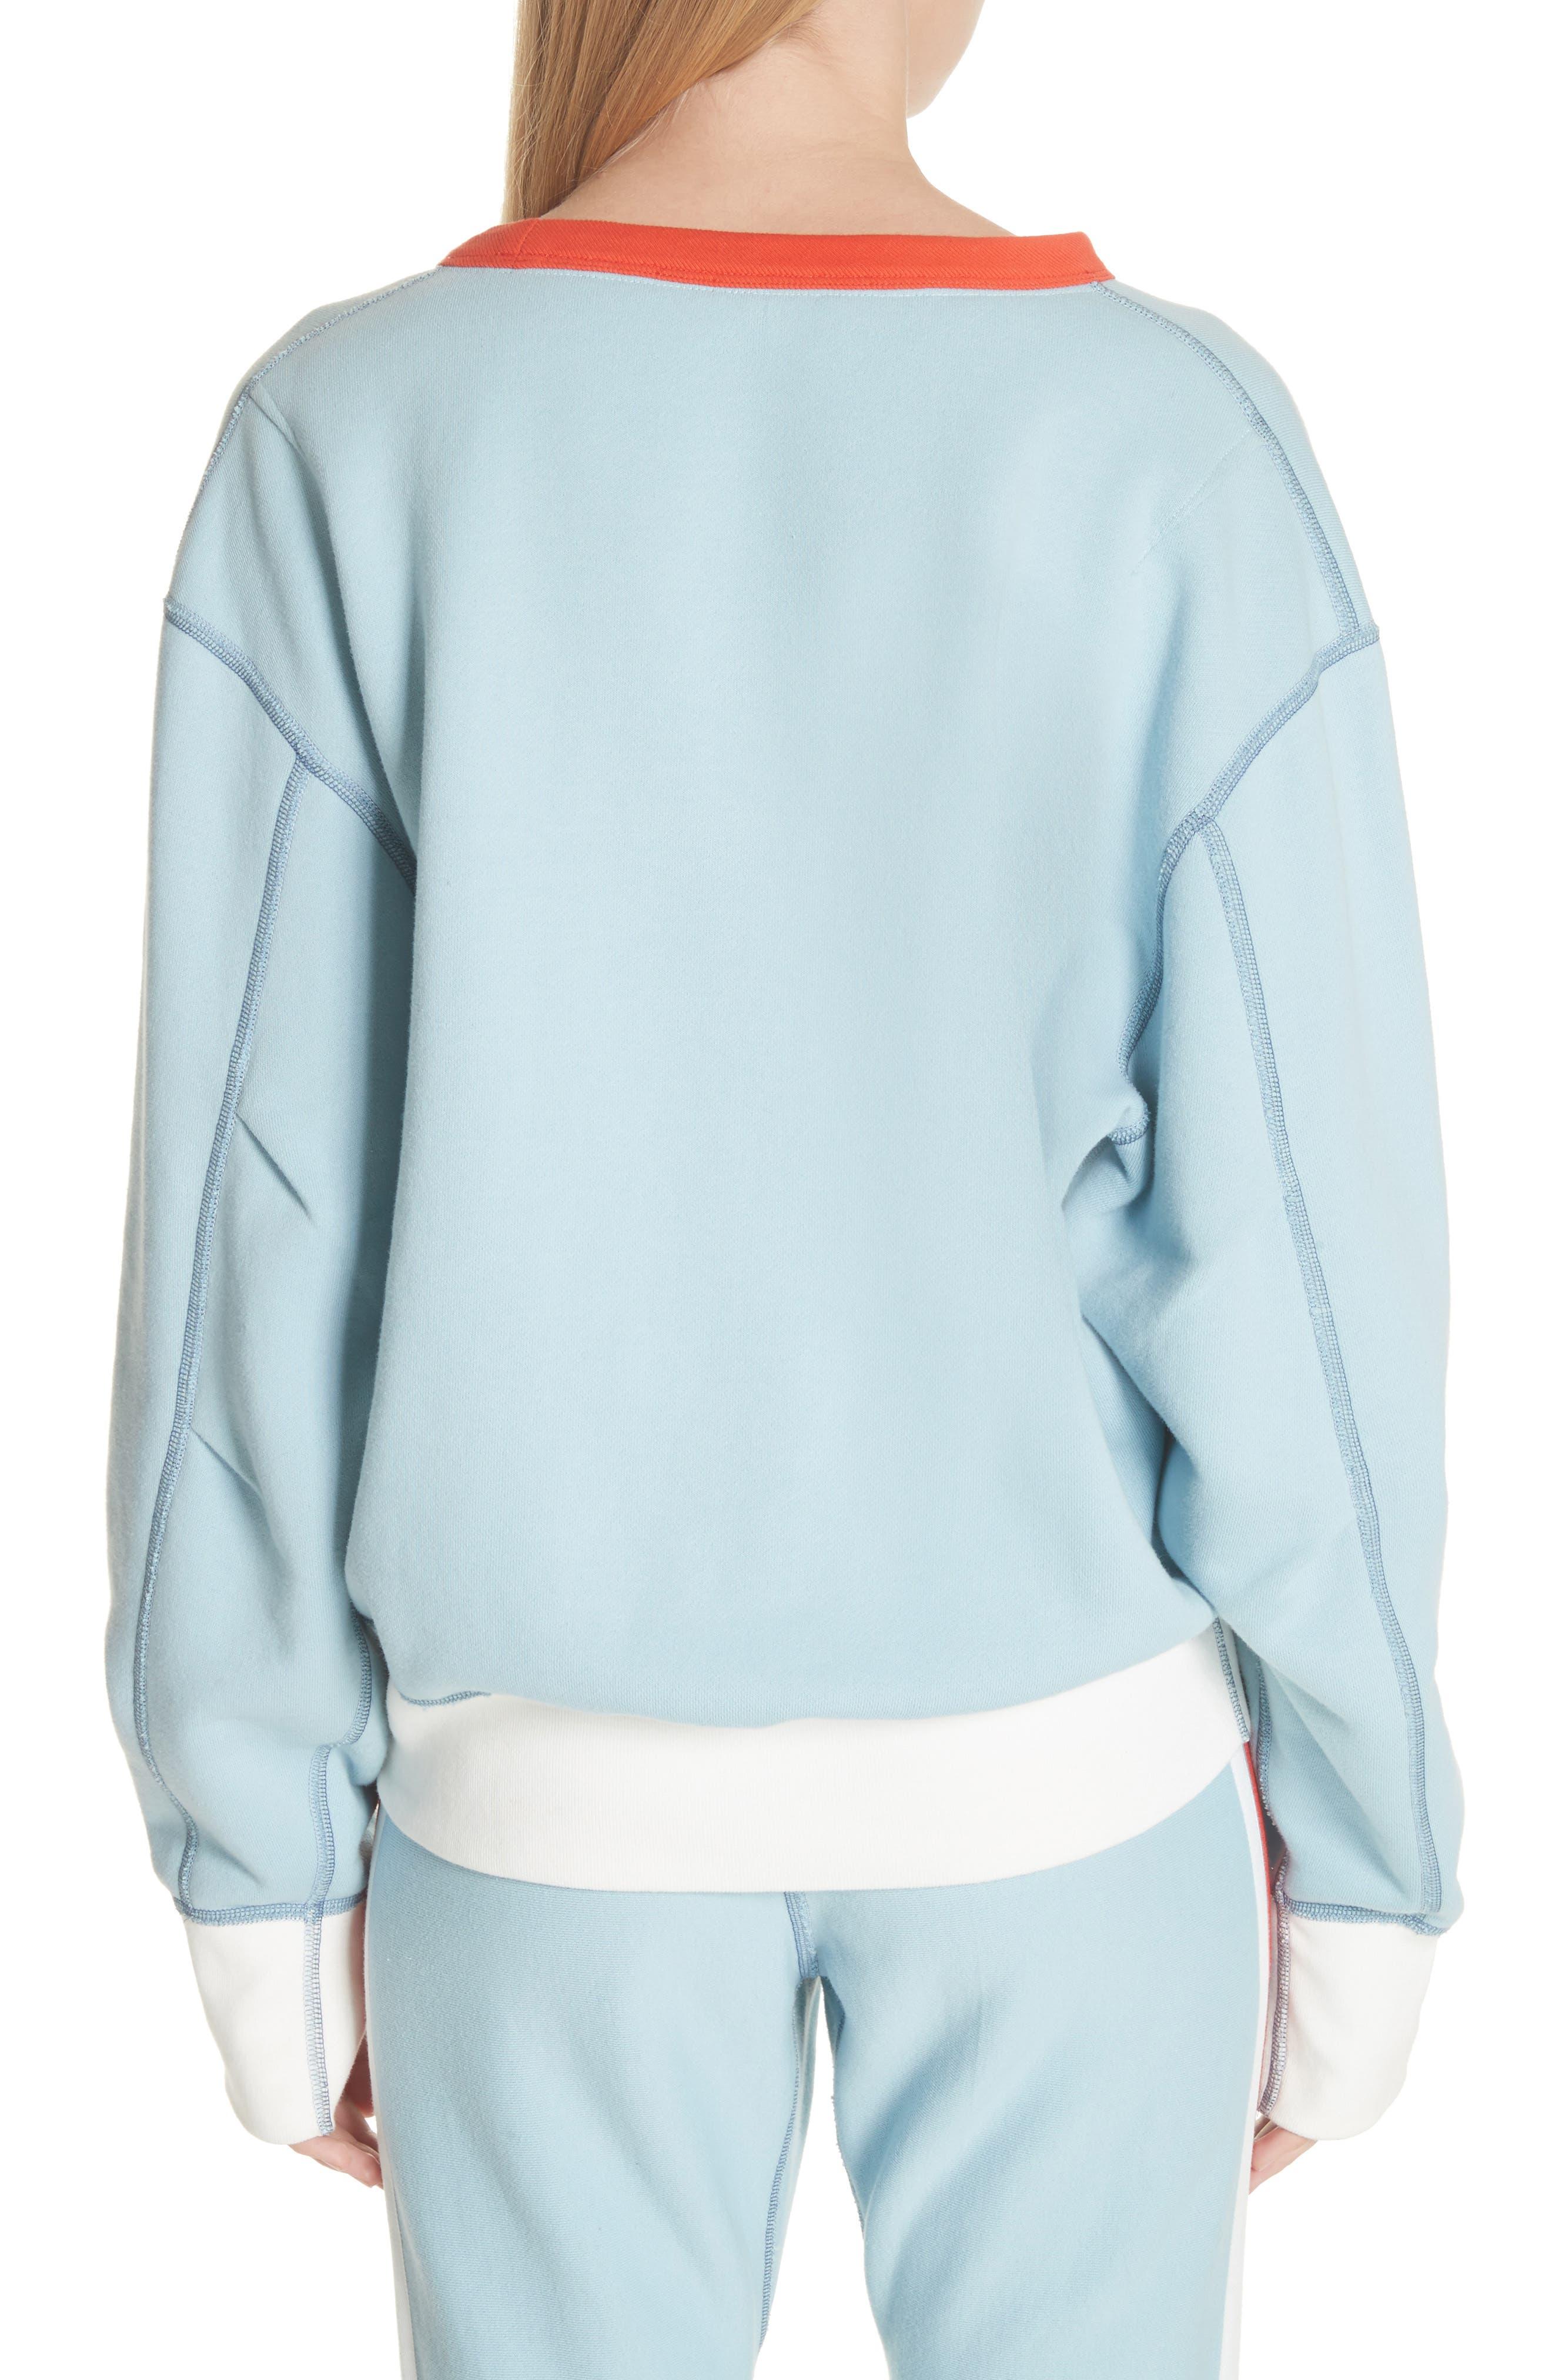 Combat Sweatshirt,                             Alternate thumbnail 2, color,                             Pale Aqua